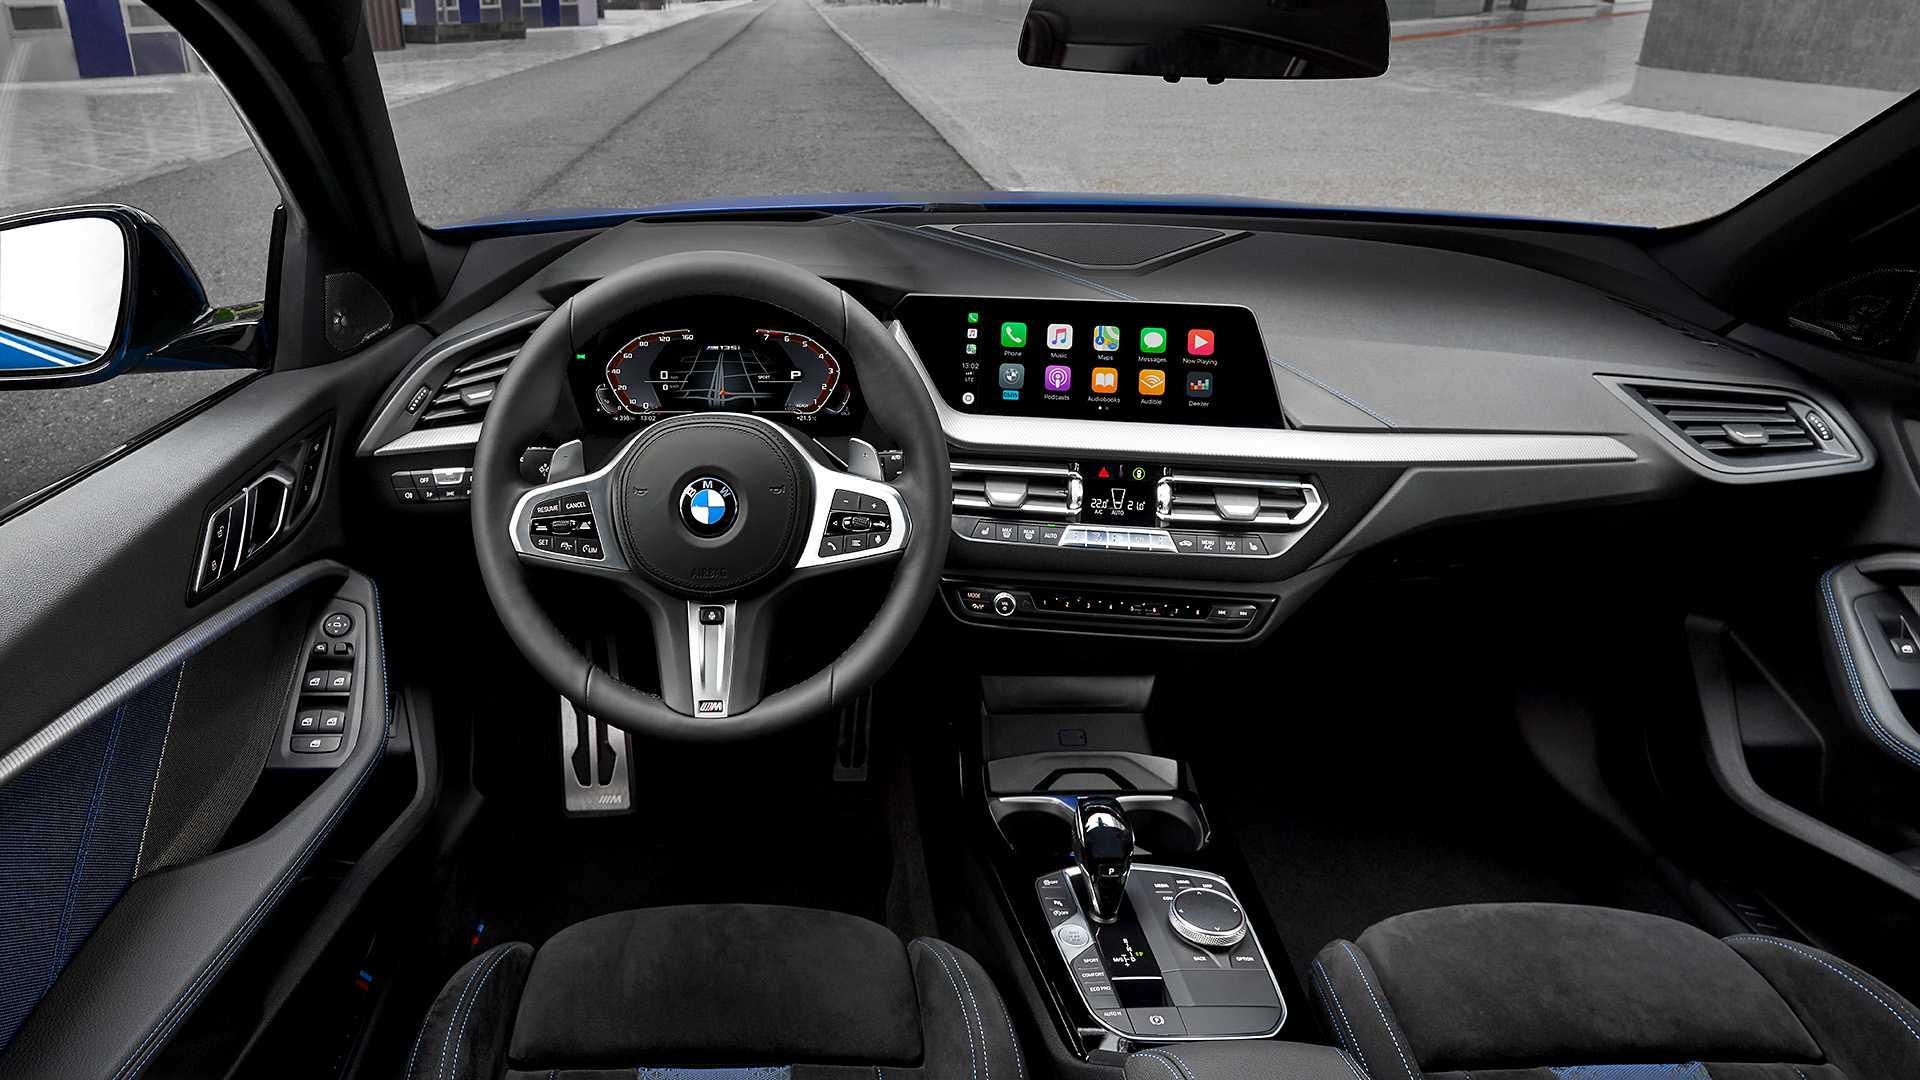 Formacar Bmw Debuts Next Gen 1 Series Hatchback